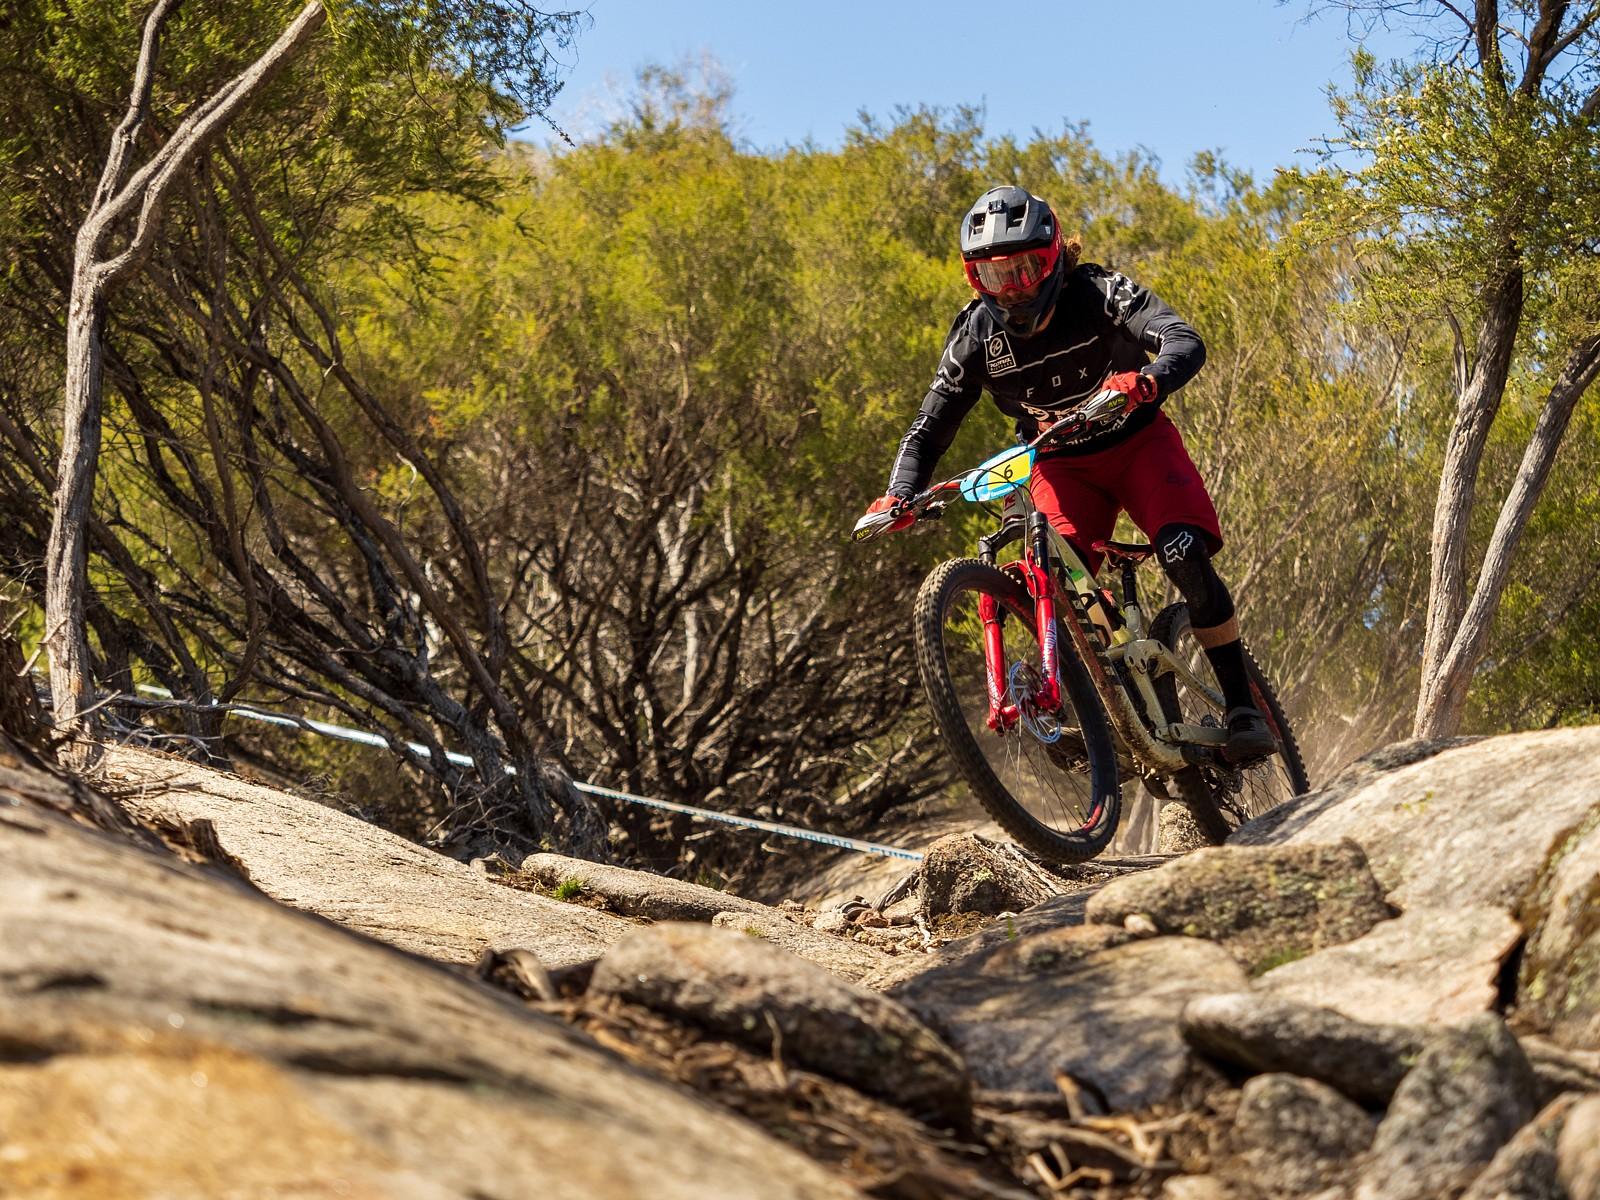 171119-Tassie-1134 - jack.fletcher86 - Mountain Biking Pictures - Vital MTB